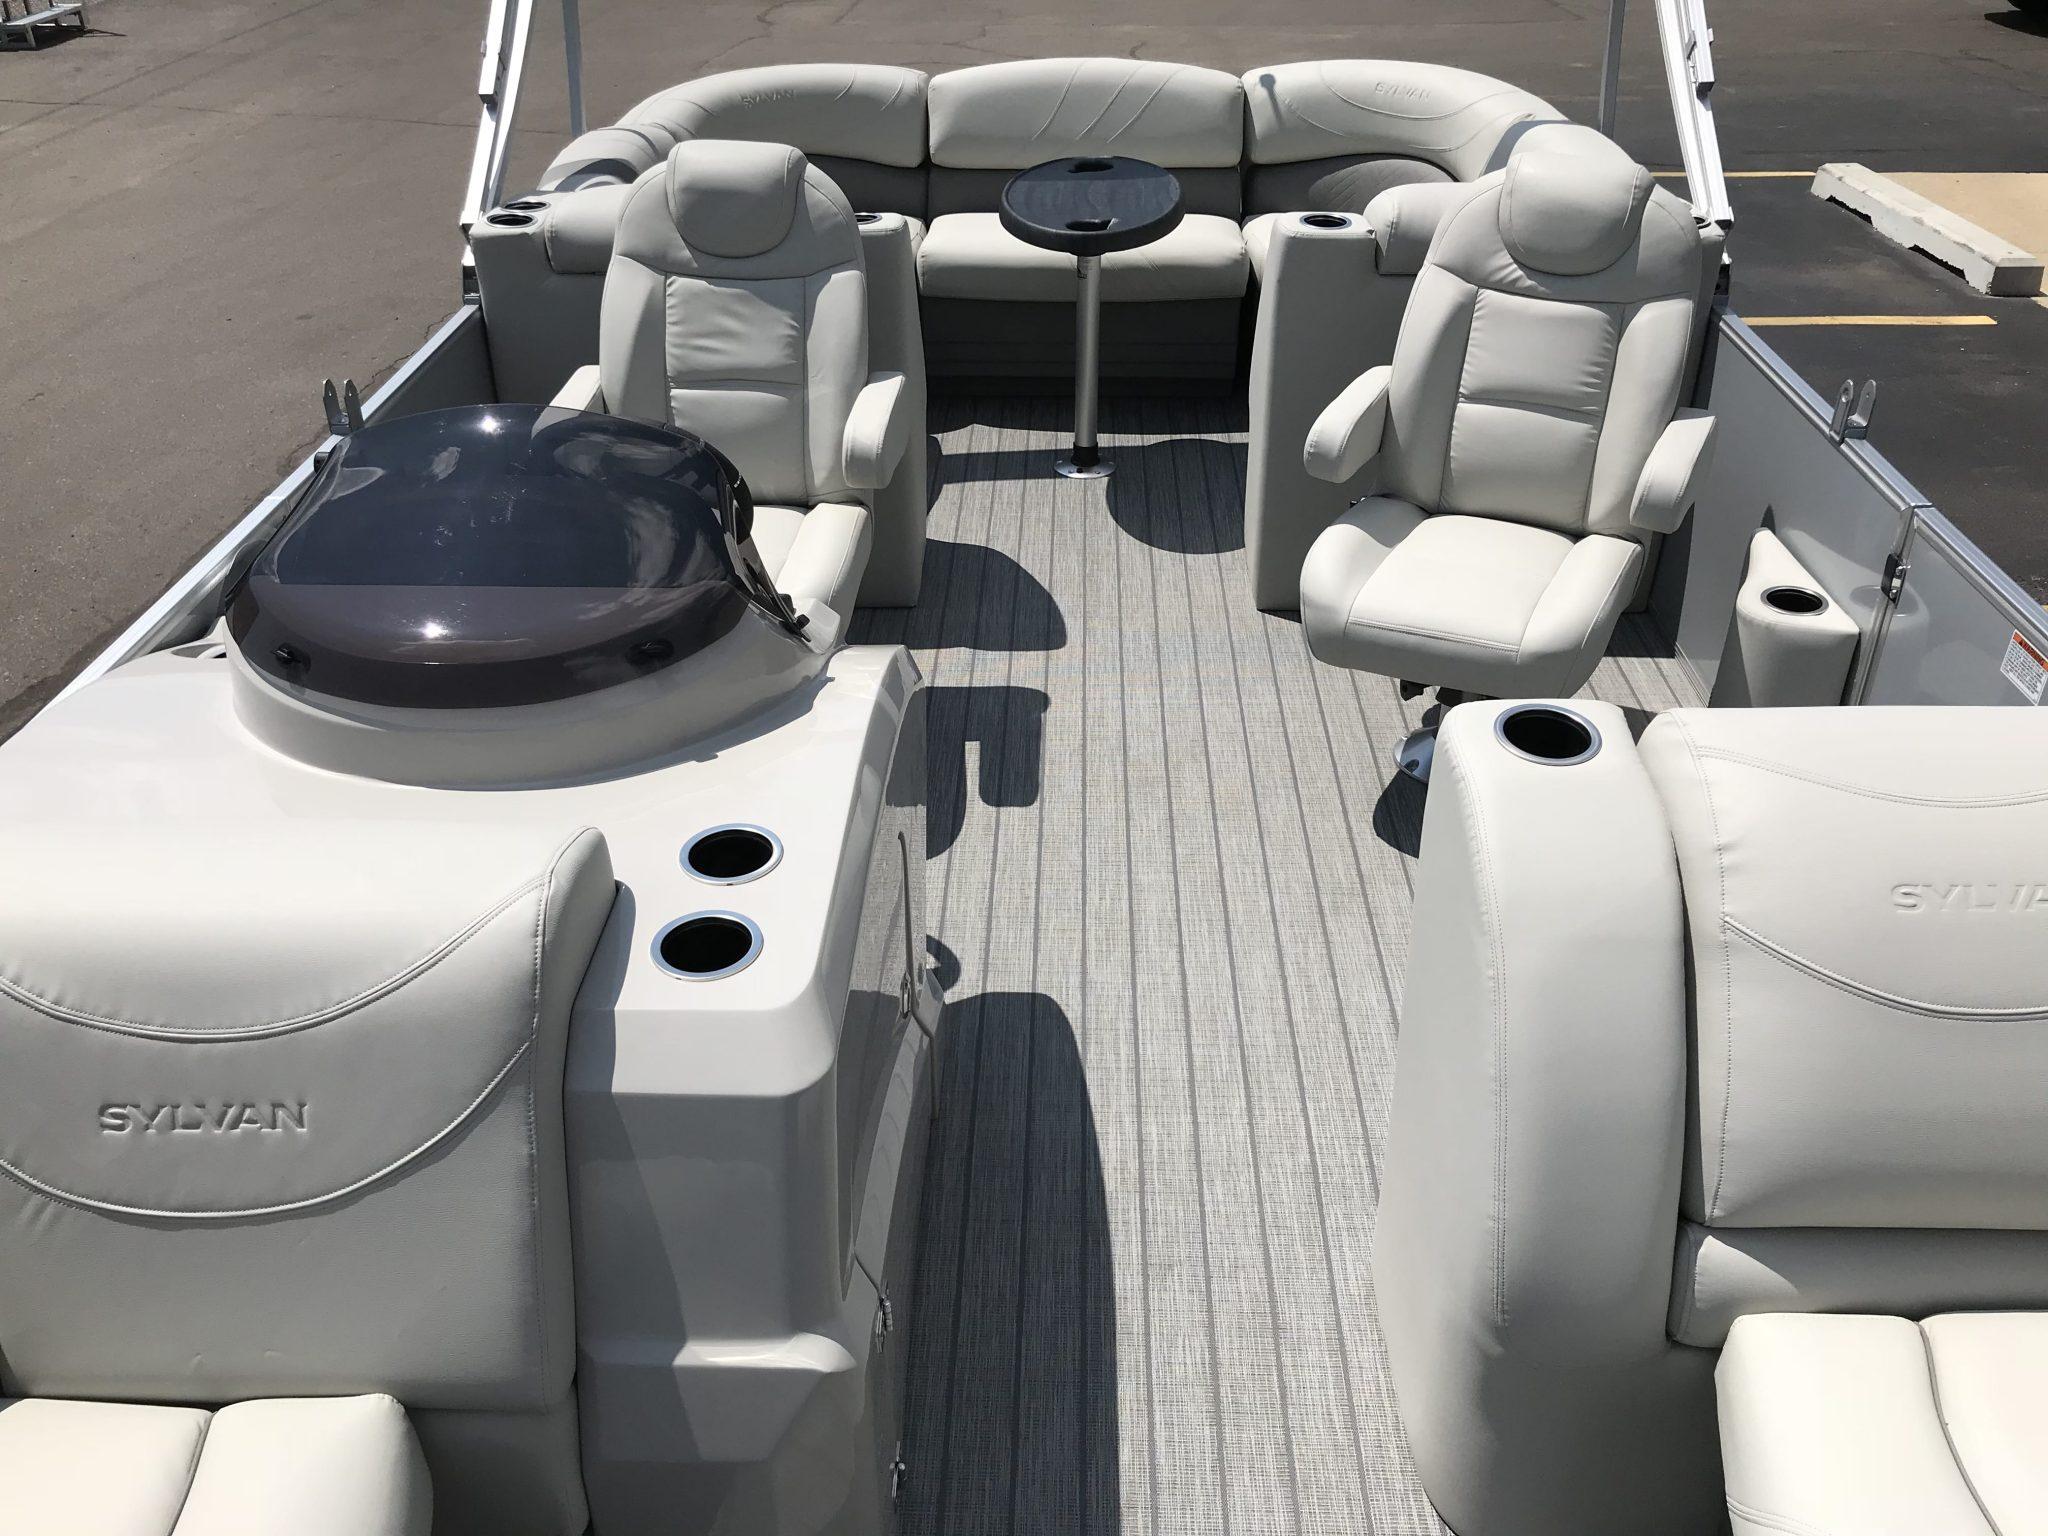 2019 Sylvan 8522 LZ LES Interior Cockpit Seating 4